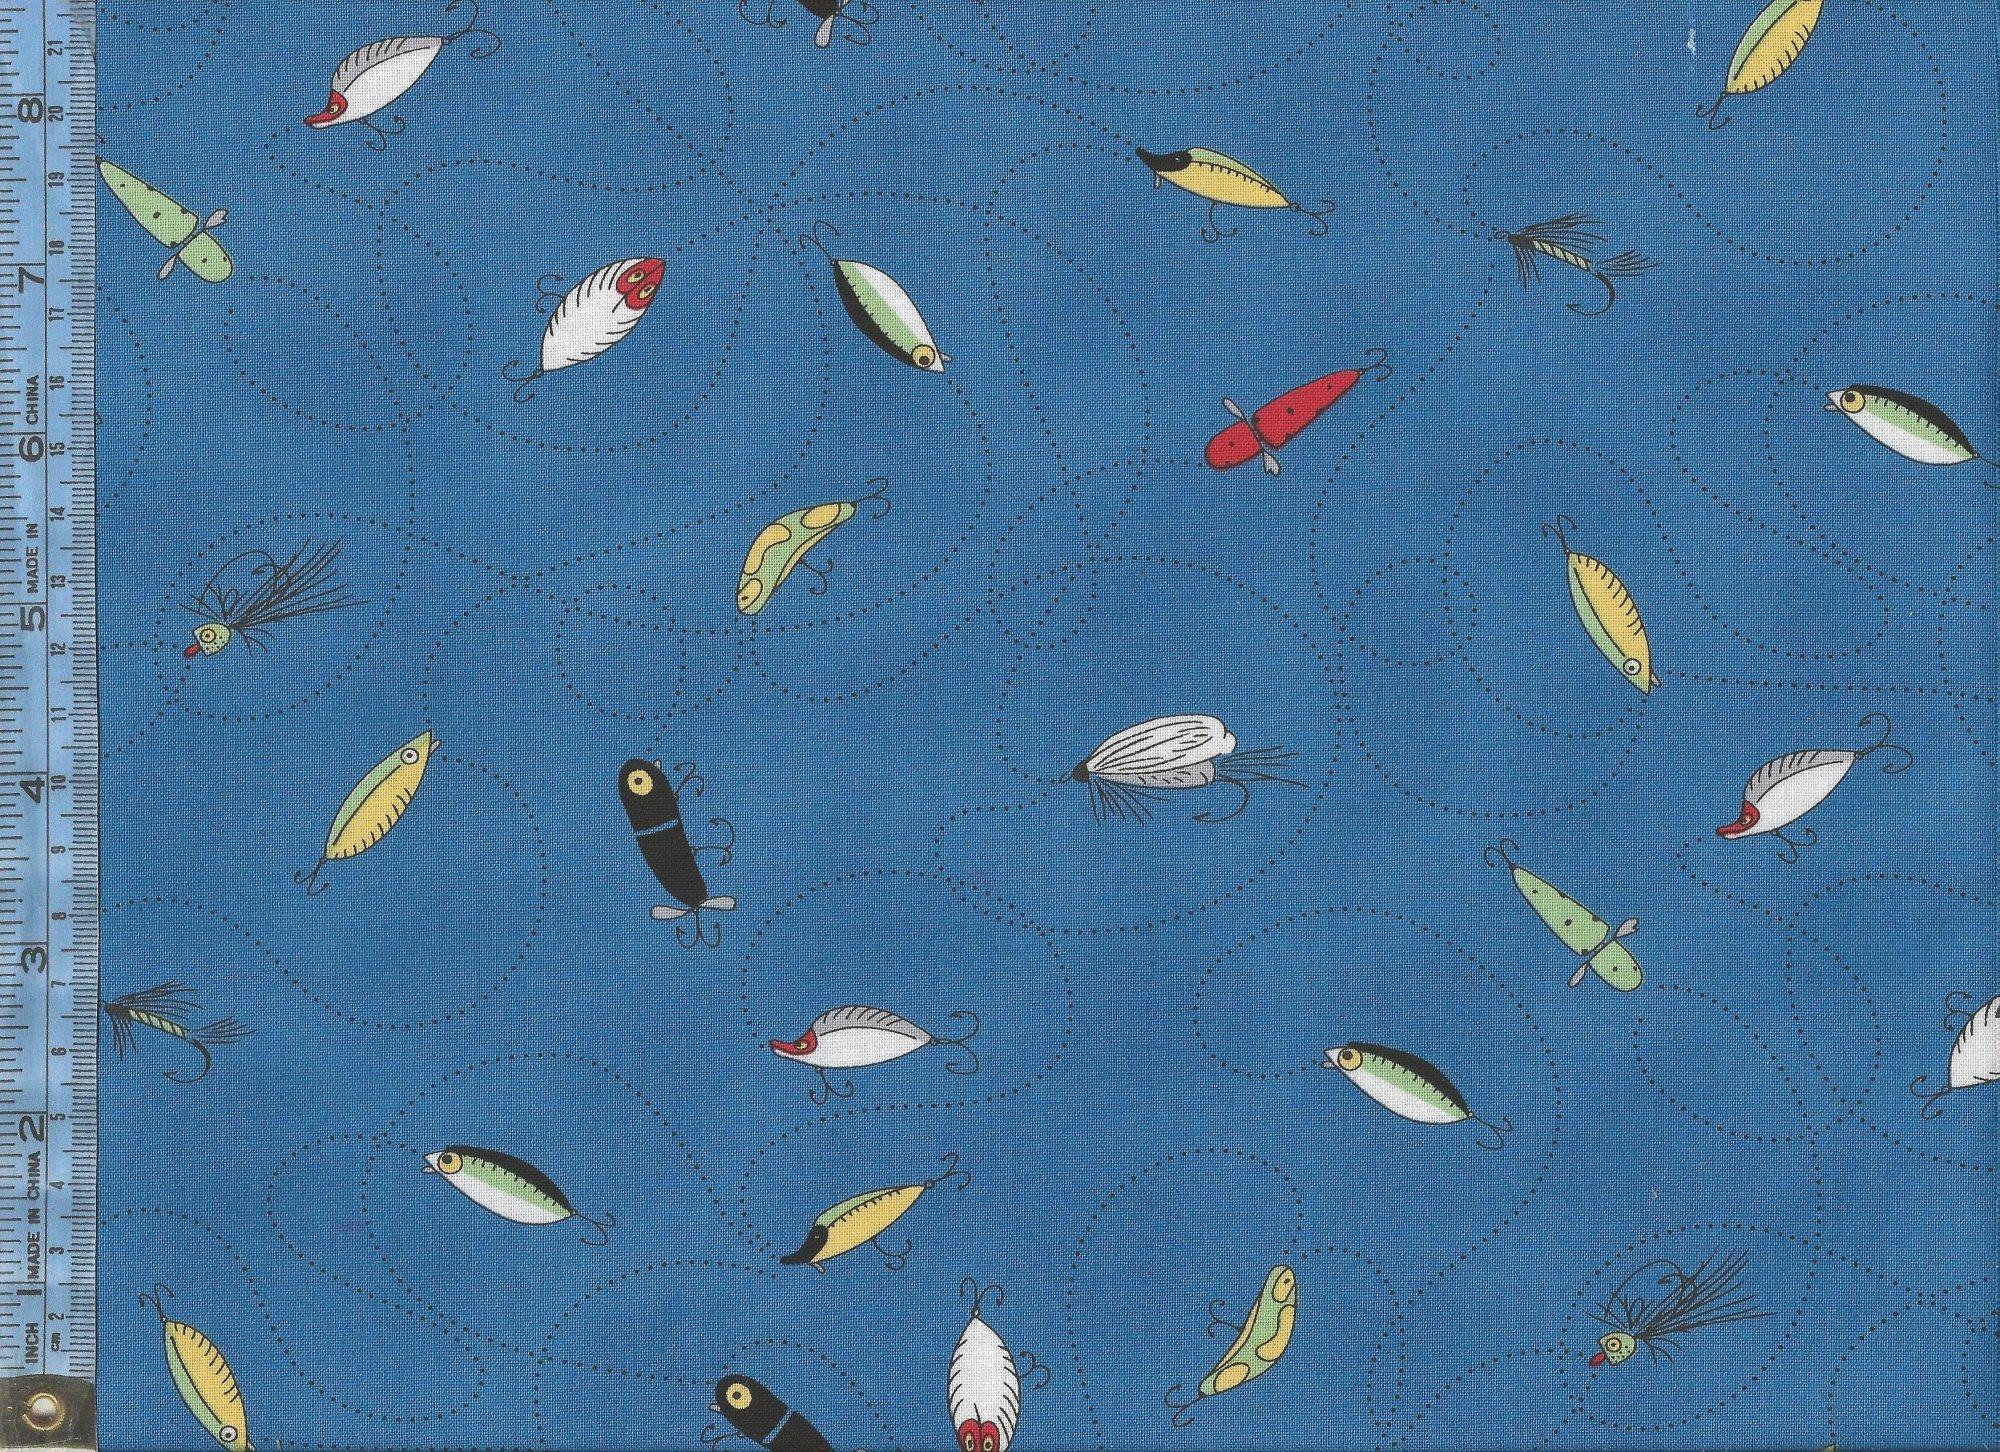 Background image 8851 - Fishline Fishing Line With Lures On Blue Background